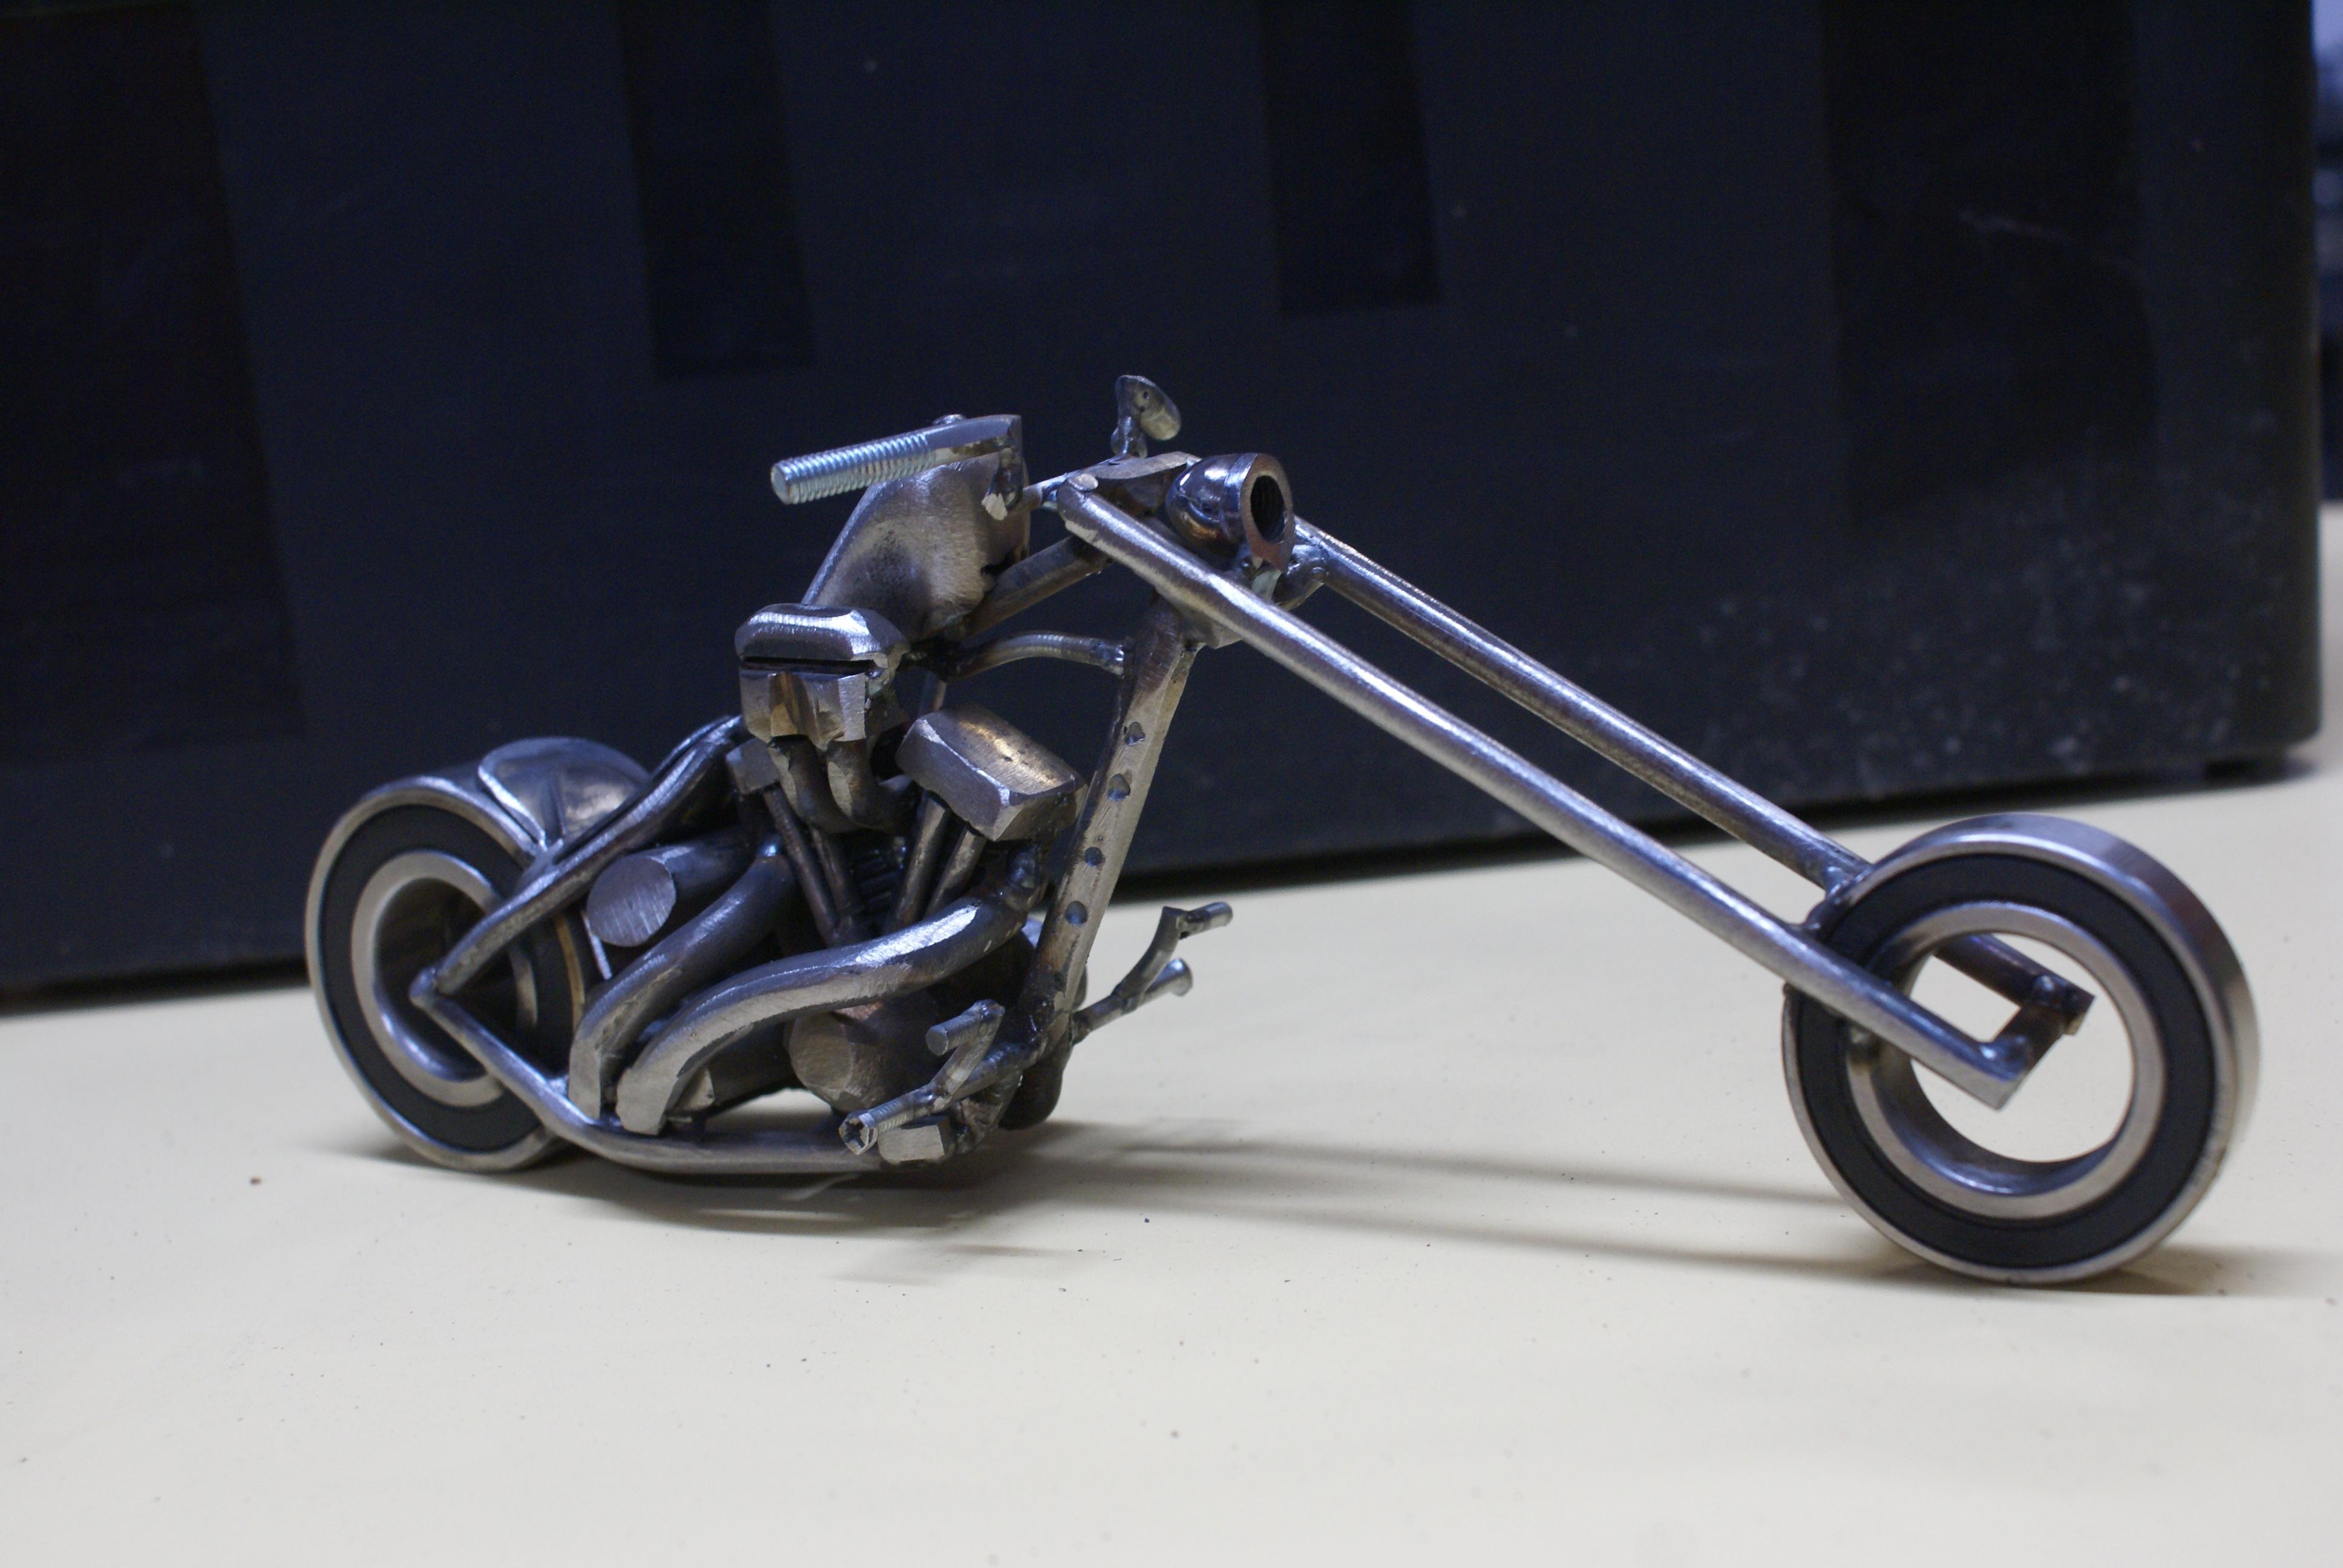 Mini Motorcycle Chopper Parts The Best 2018 Engine Diagram